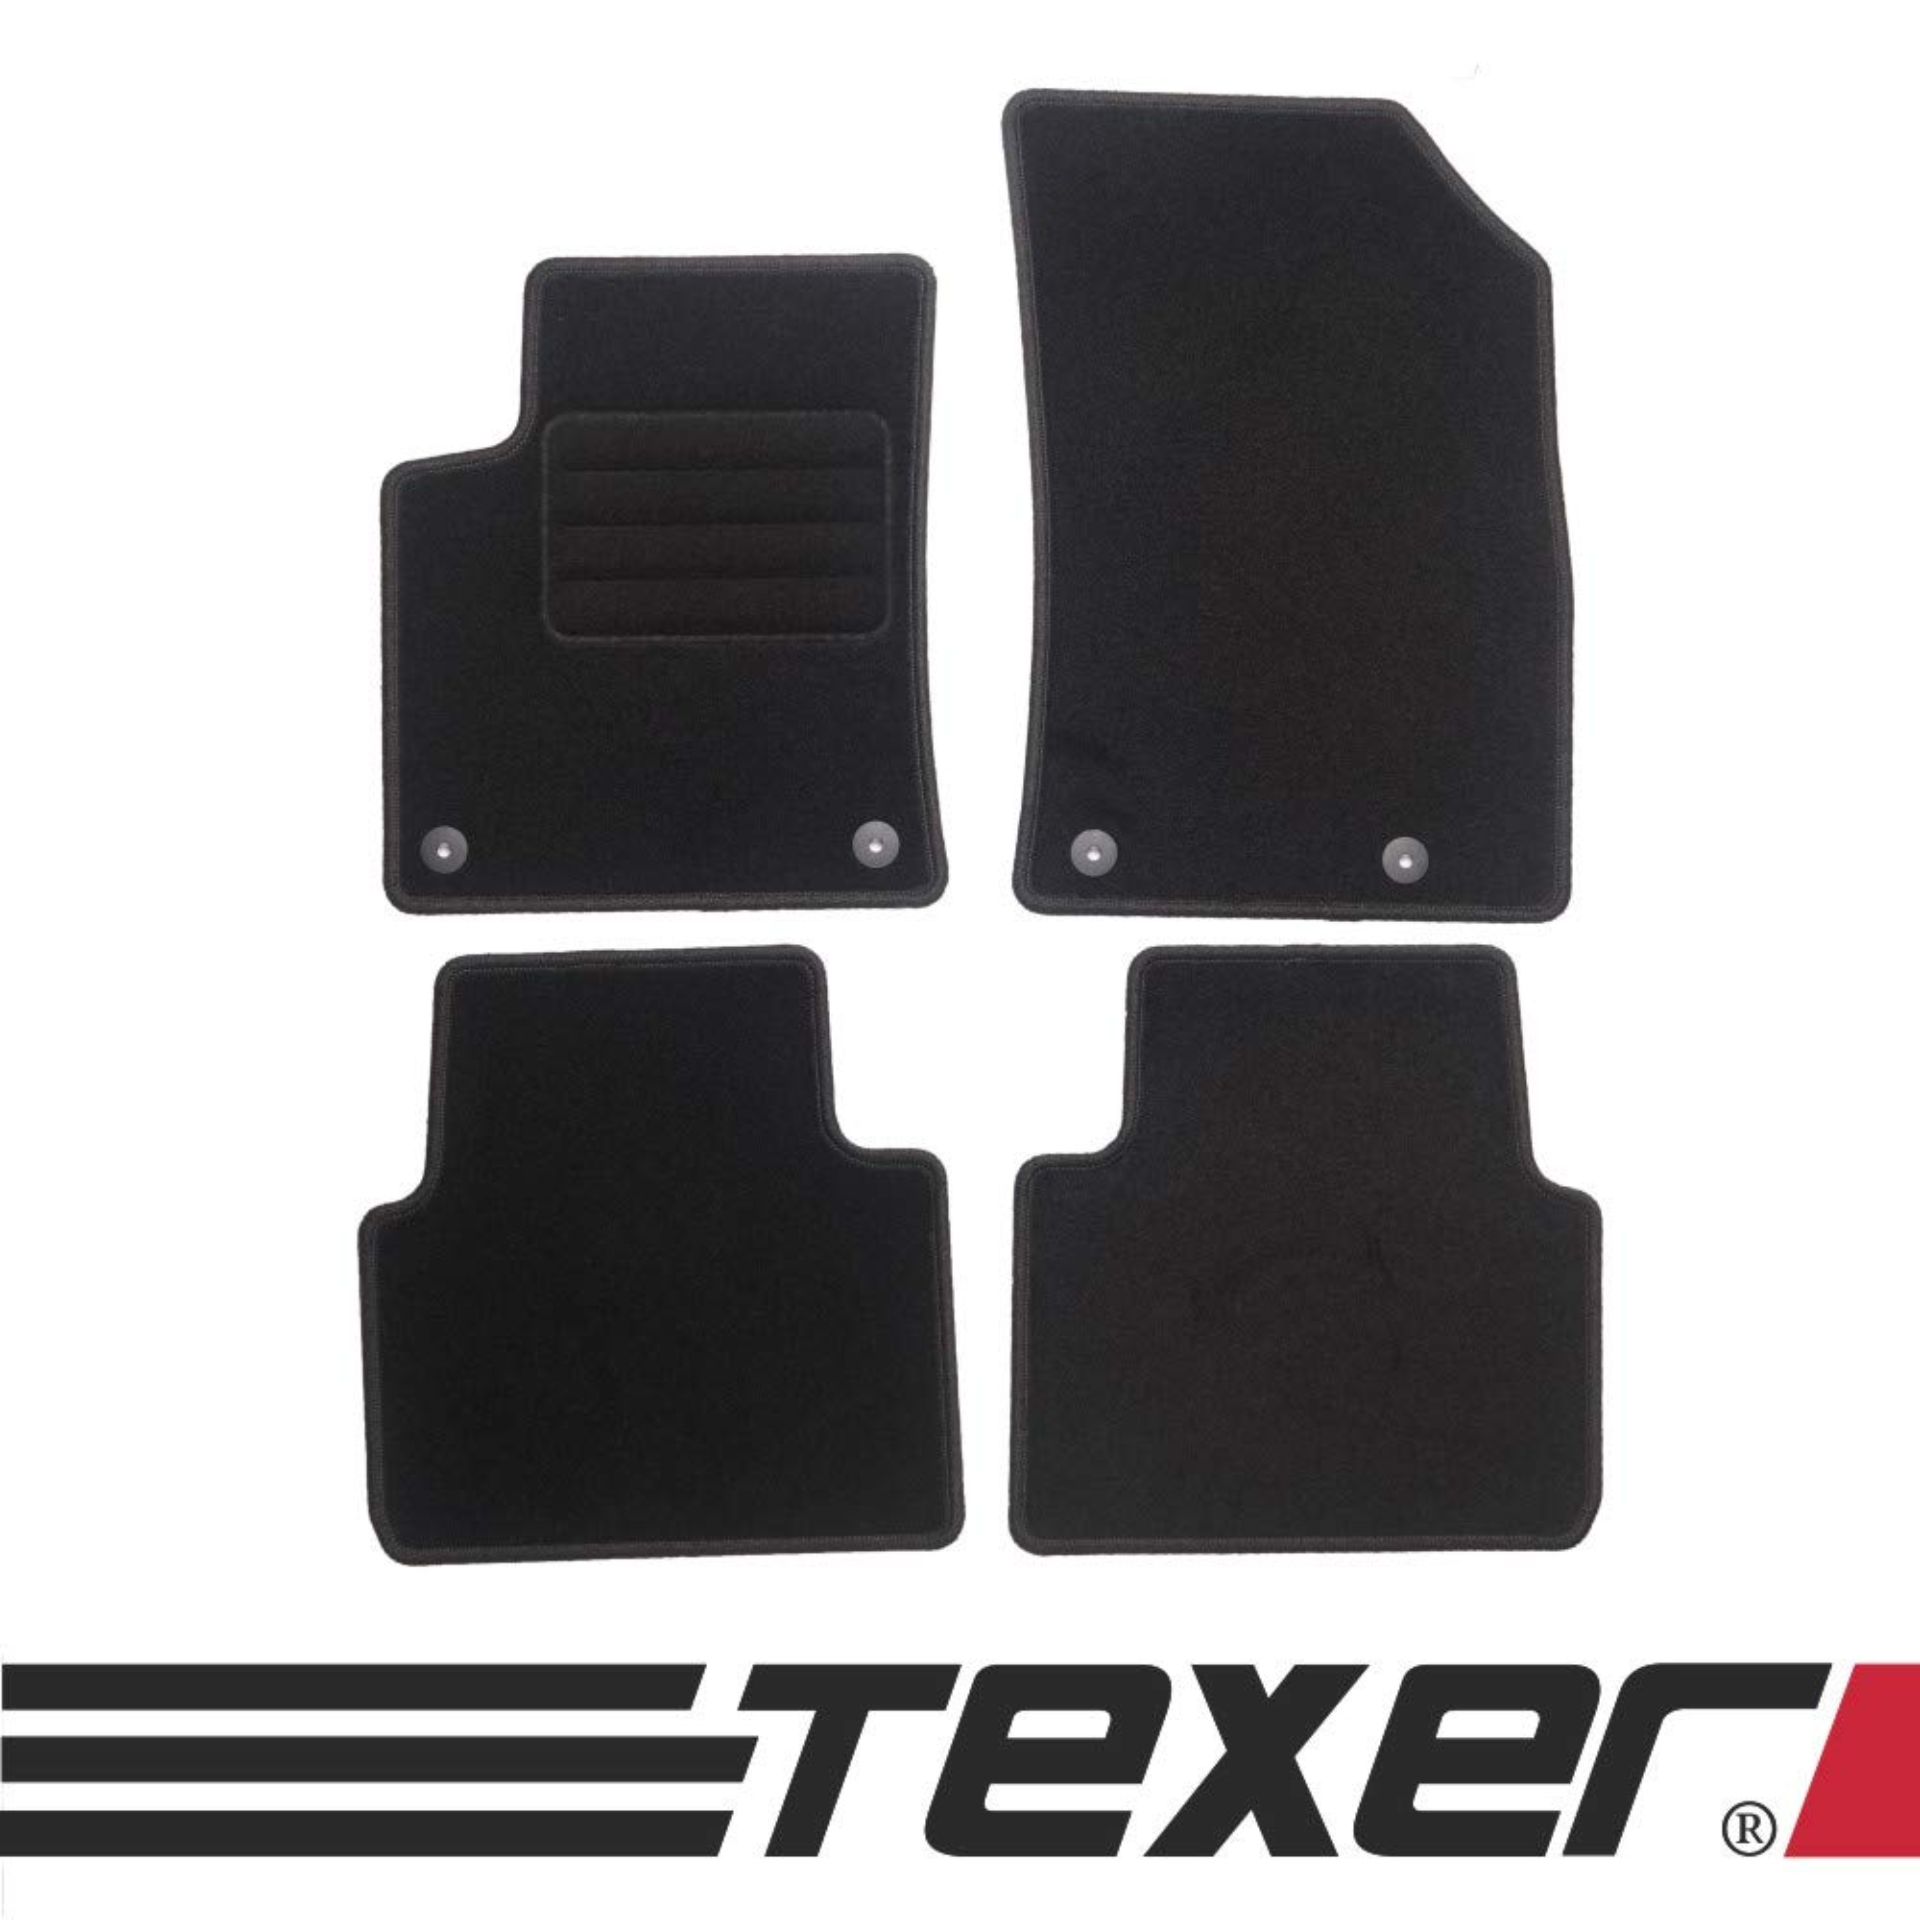 CARMAT TEXER Textil Fu/ßmatten Passend f/ür Mercedes-Benz E-Klasse W124 Bj 1984-1997 Basic